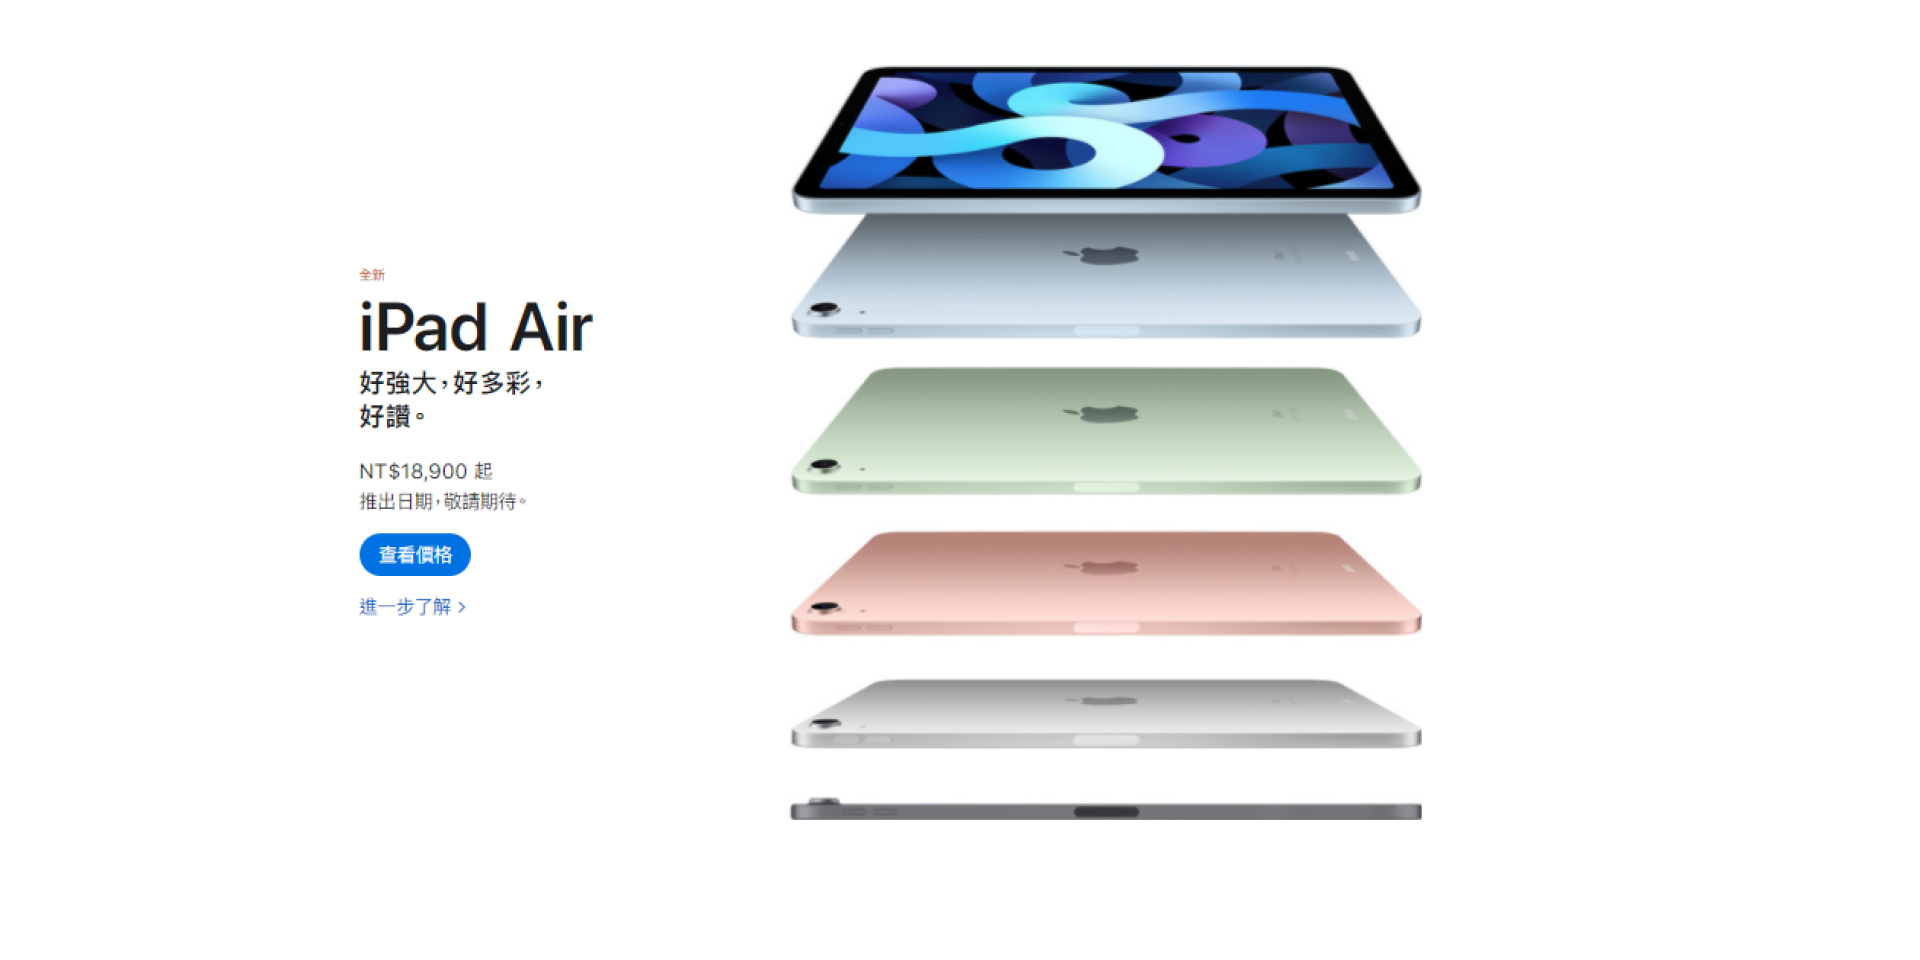 A14晶片、方正外型、多彩新色!APPLE 全新「iPad Air」 18,900元起正式亮相